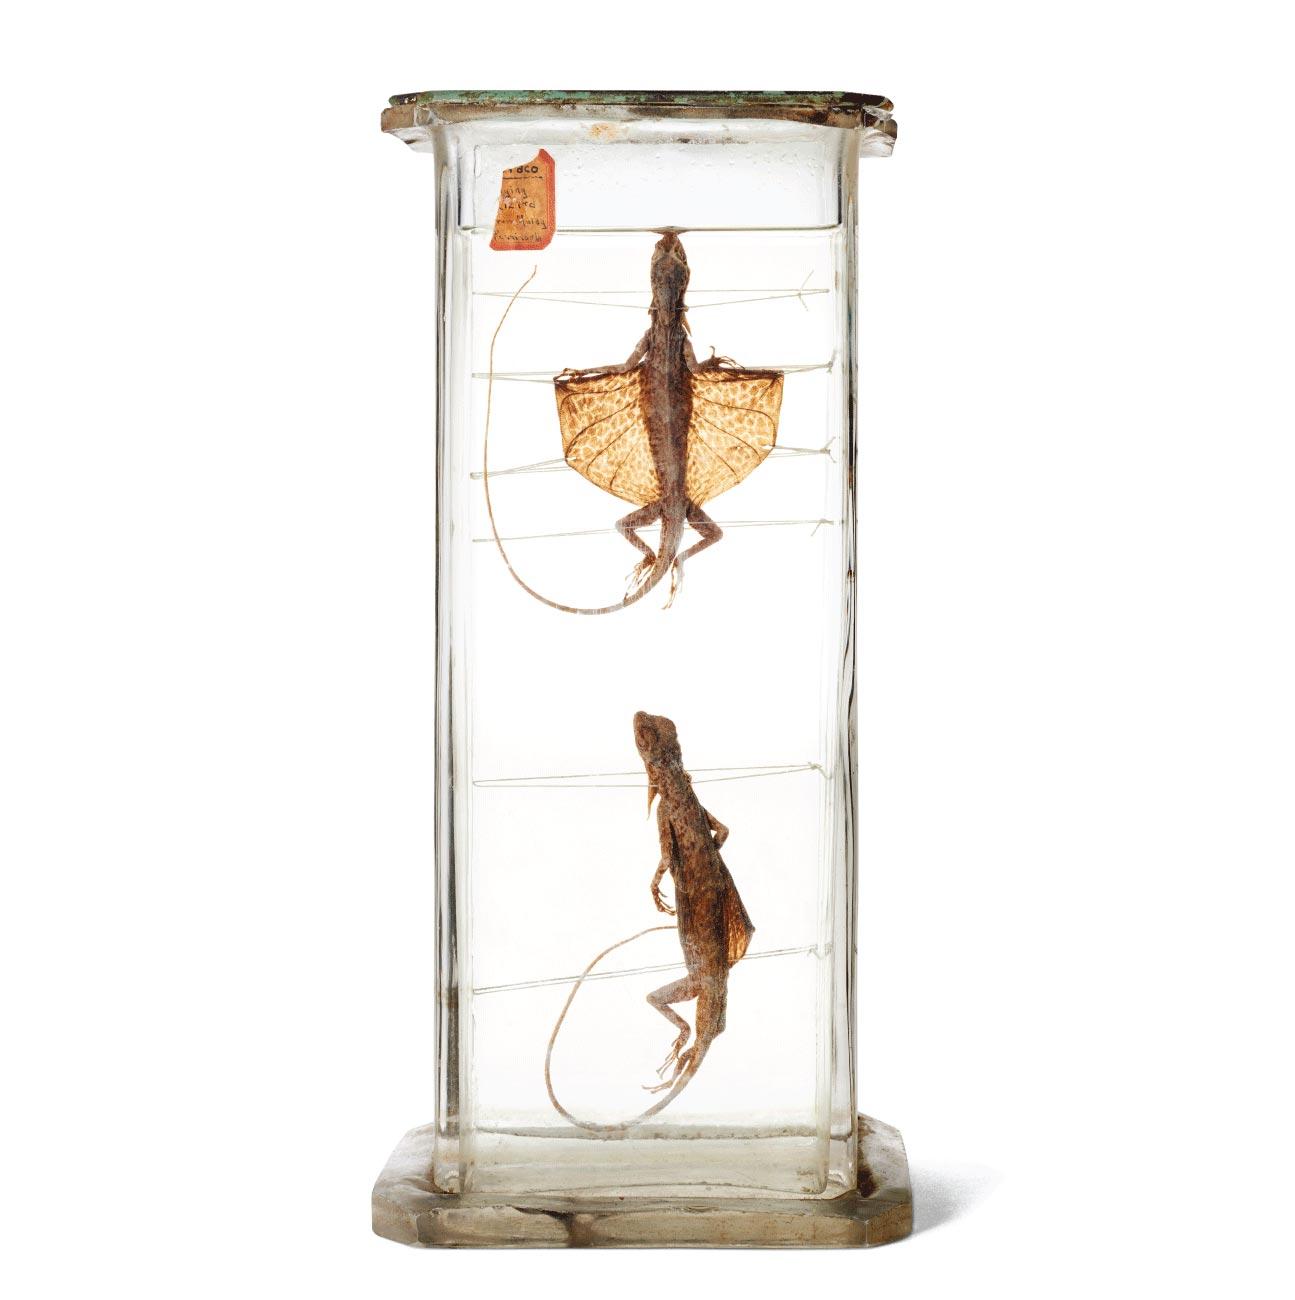 Flying lizard specimen in antique glass jar